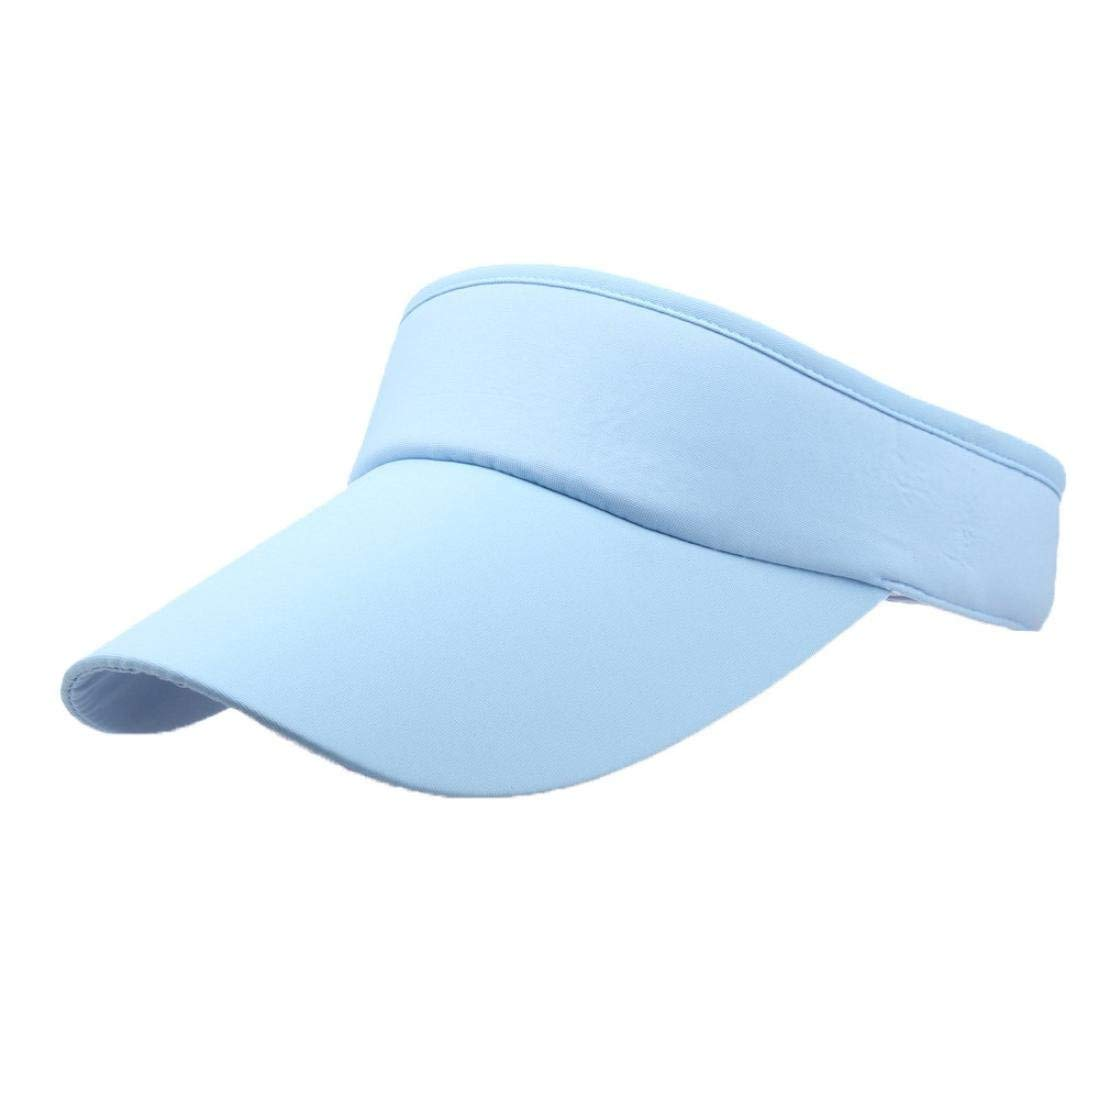 cbed9d3082fc9 Get Quotations · Buyeverything Men Women Sport Sun Visor One Size Velcro Cap  Classic Fitness Outdoor Activity Exercise Sun